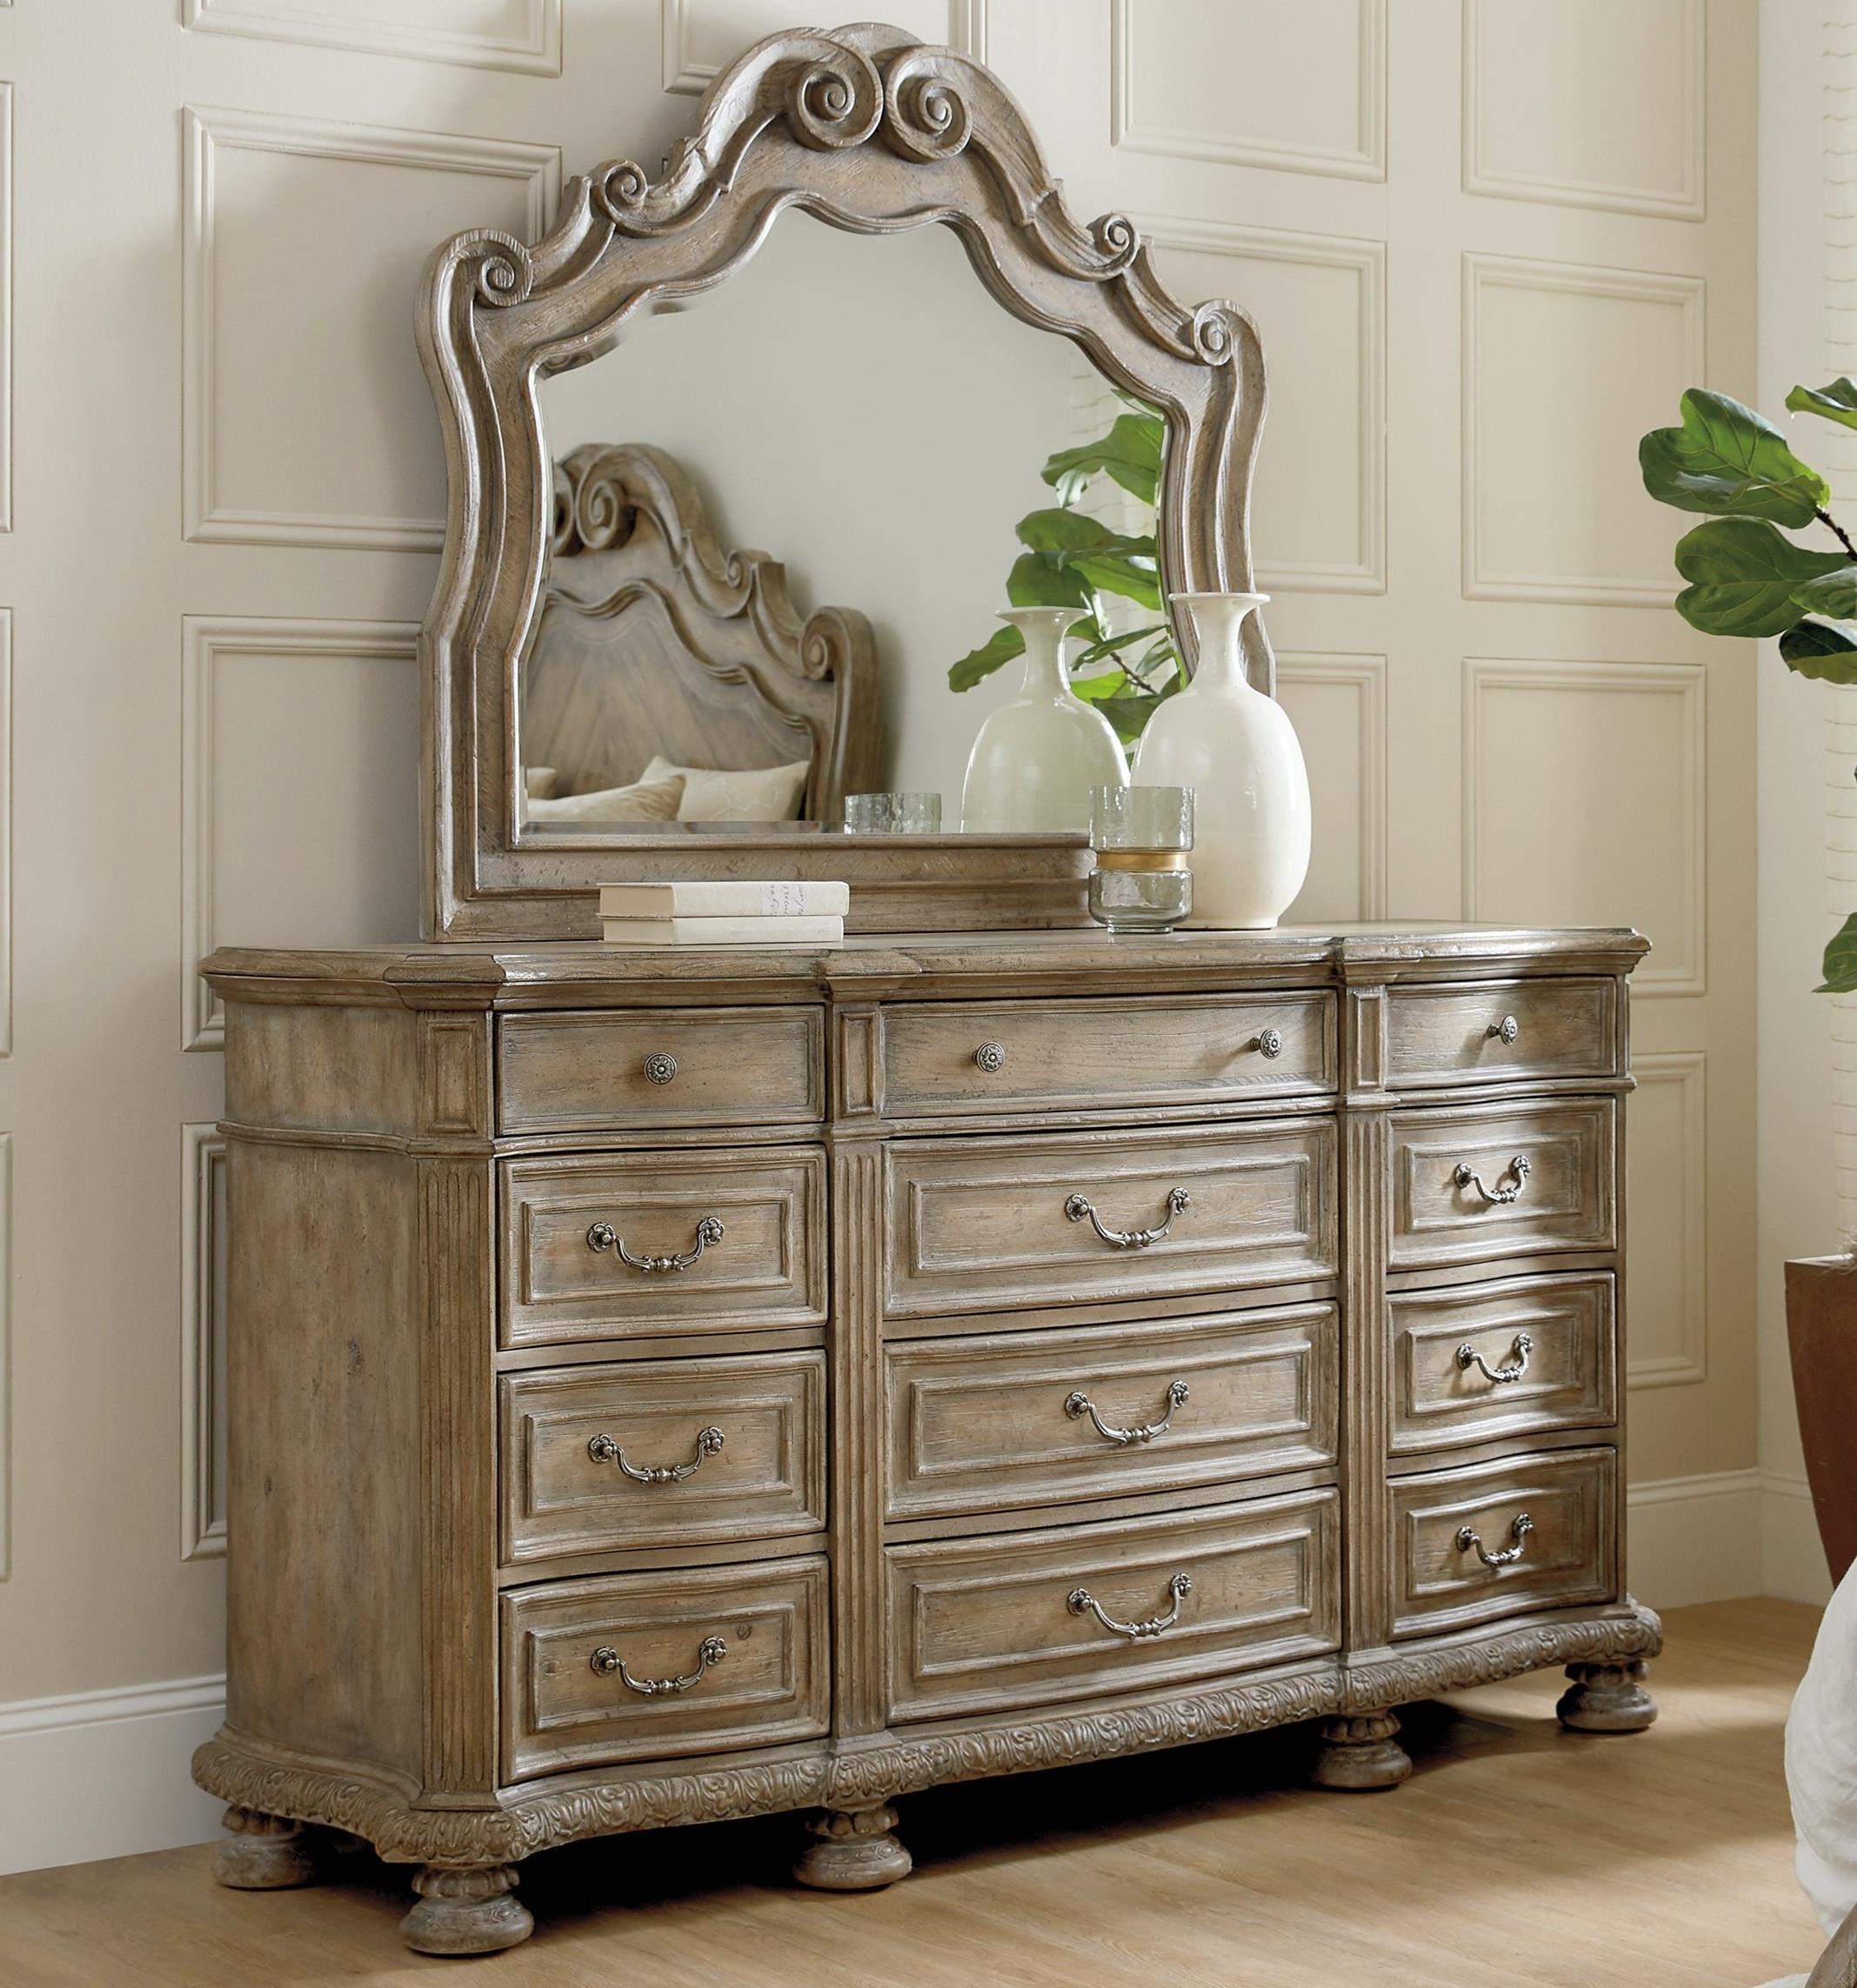 Castella Dresser and Mirror Set by Hooker Furniture at Stoney Creek Furniture